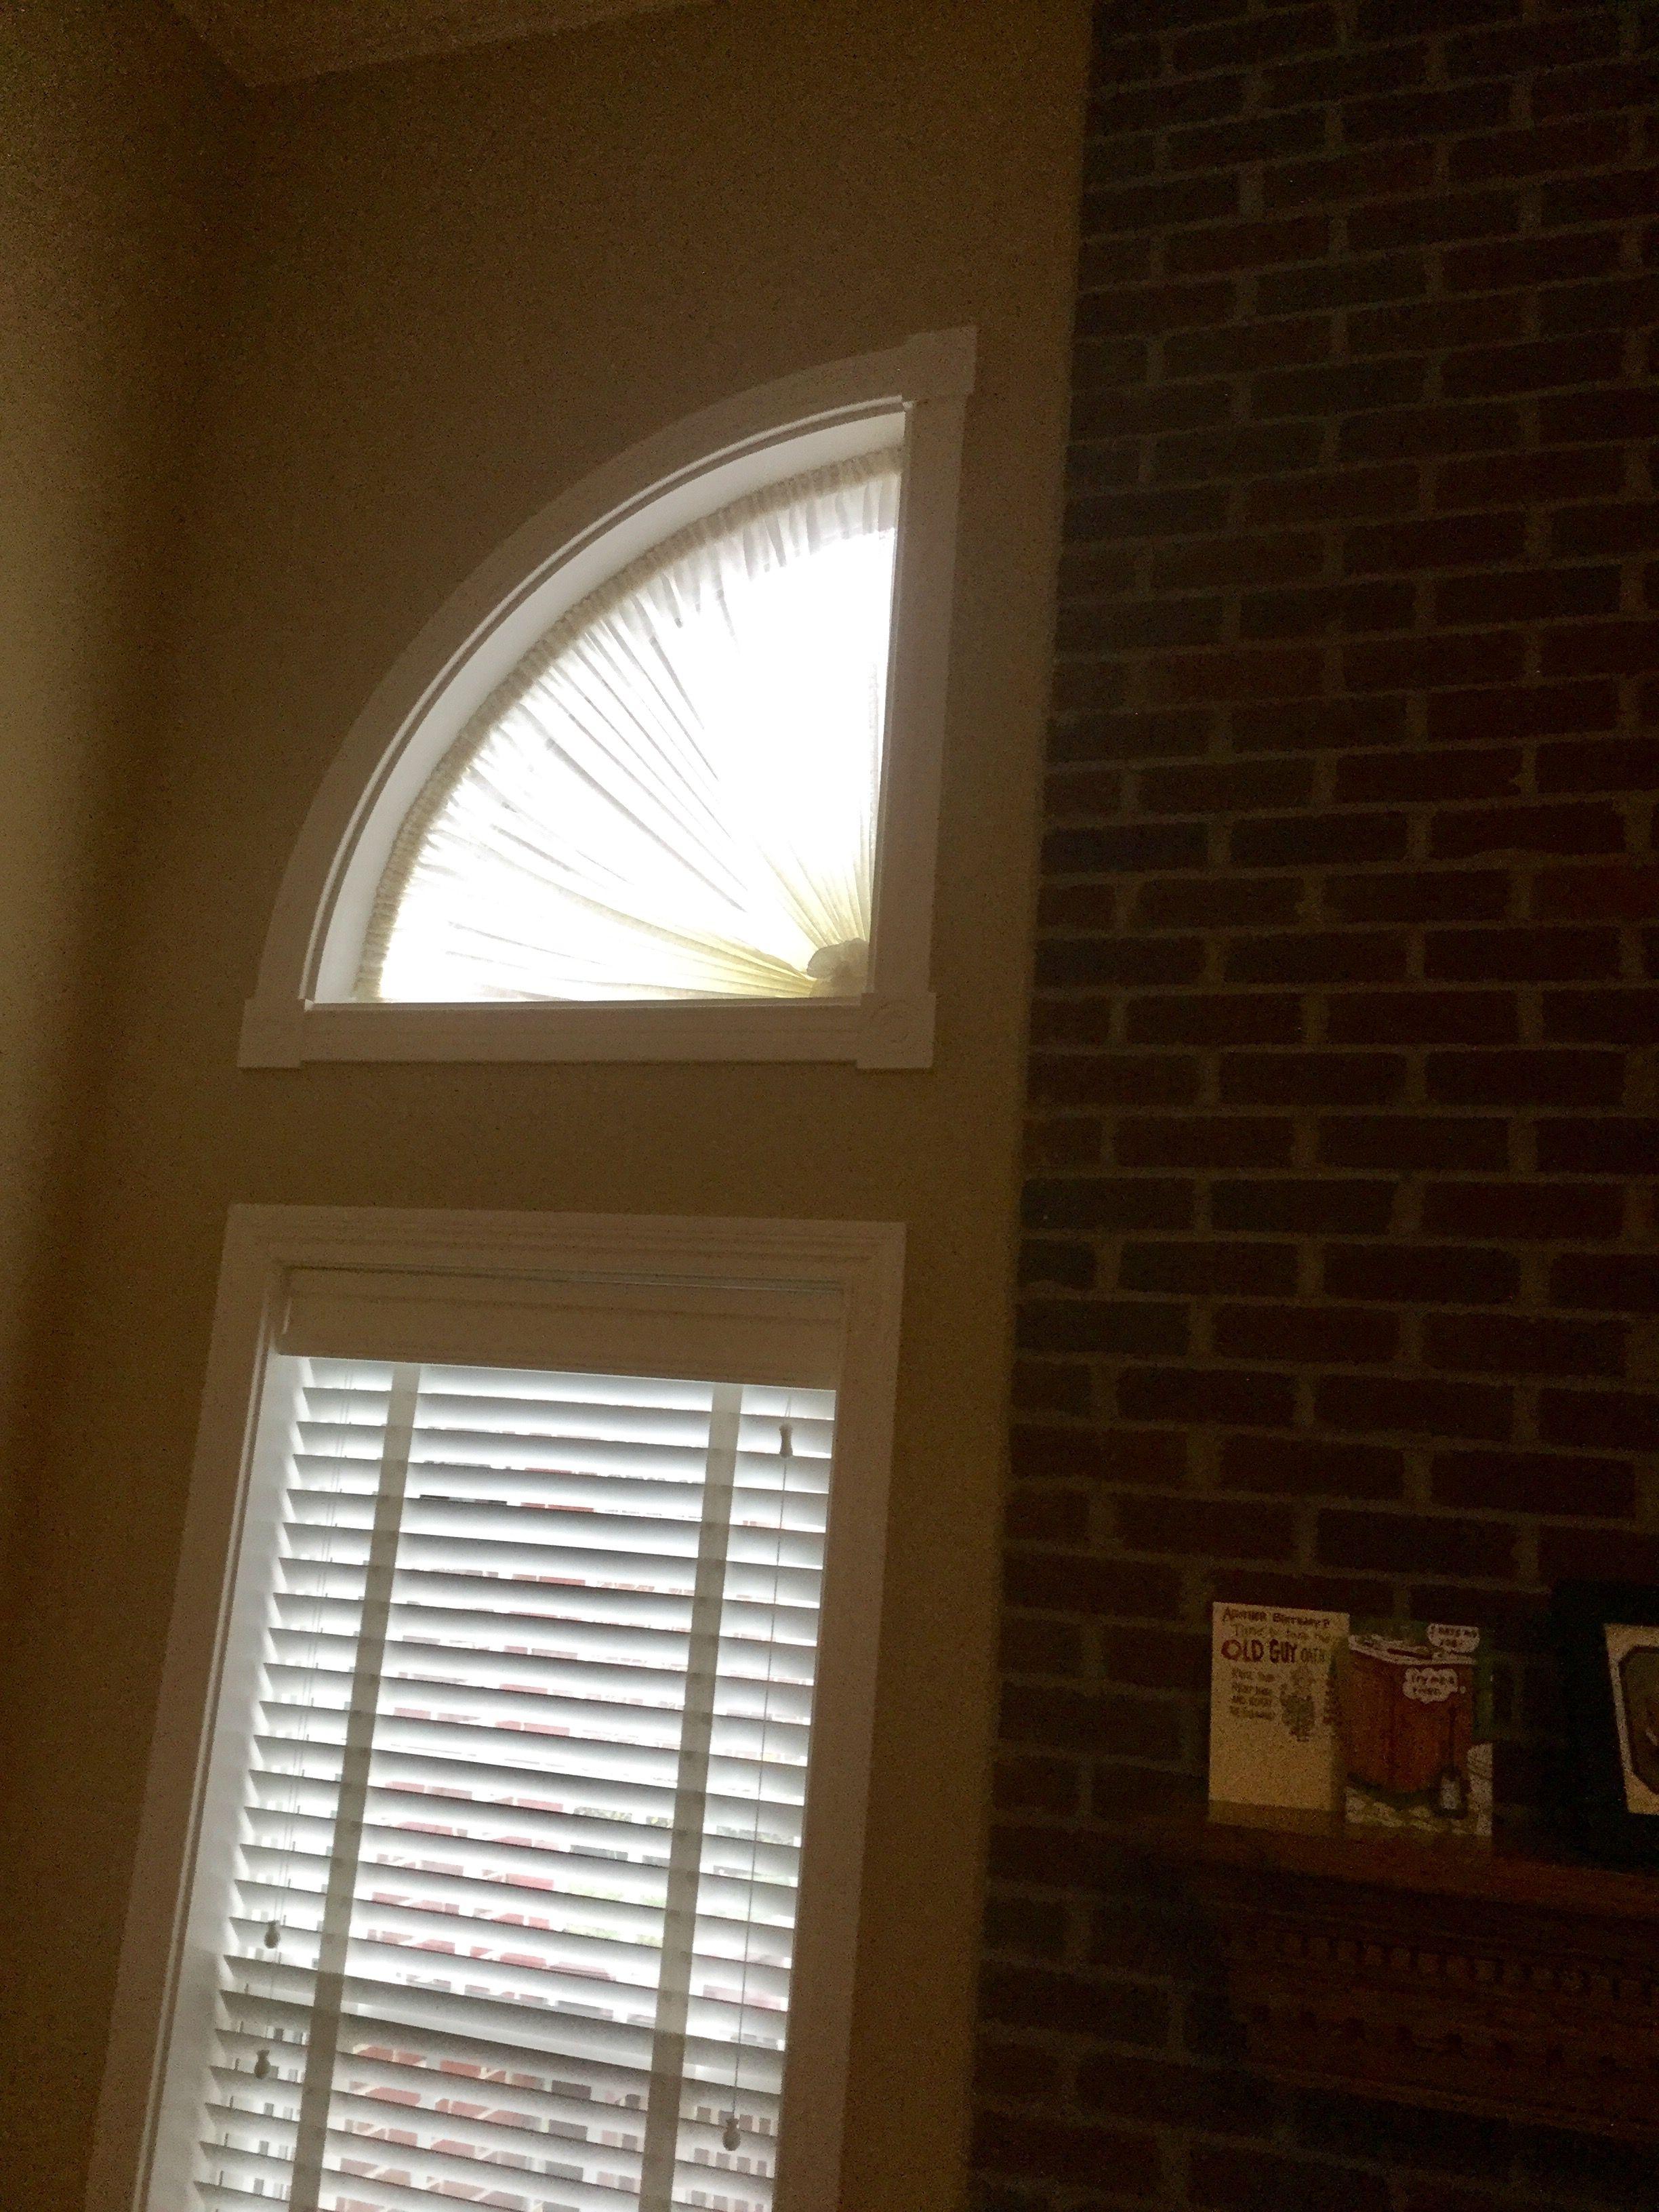 Eyebrow window coverings  pin by betty thorwart on windows  pinterest  window